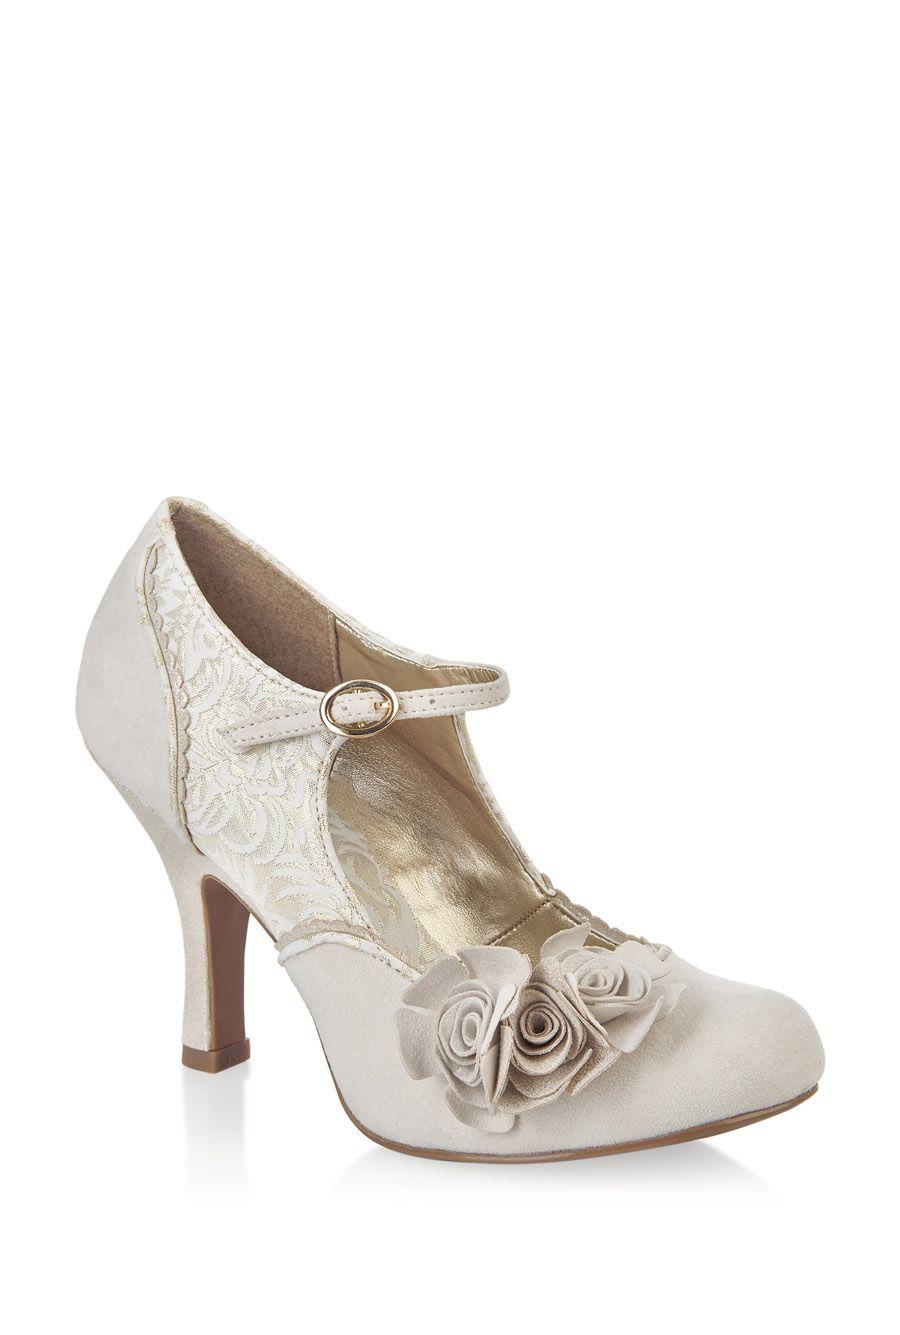 a5db7ece317 Amy Huberman Love Black Stiletto | Ruby Shoo Footwear & Bags | Black ...